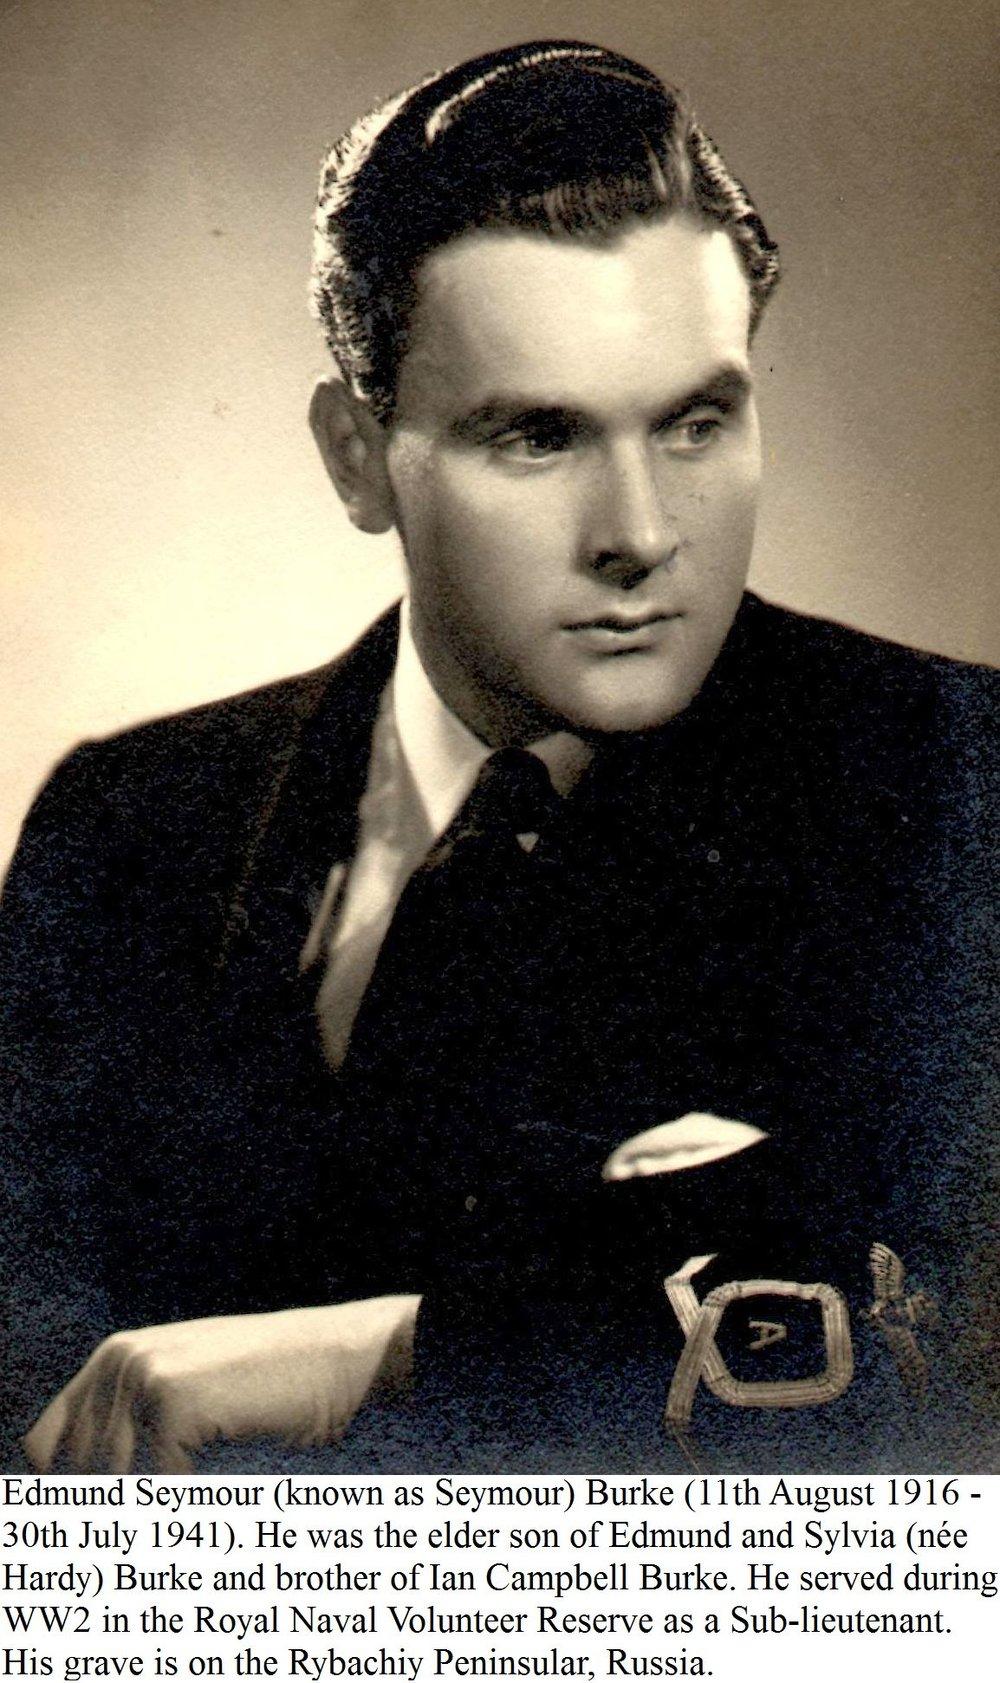 Sub-Lieutenant Edmund Seymour Burke